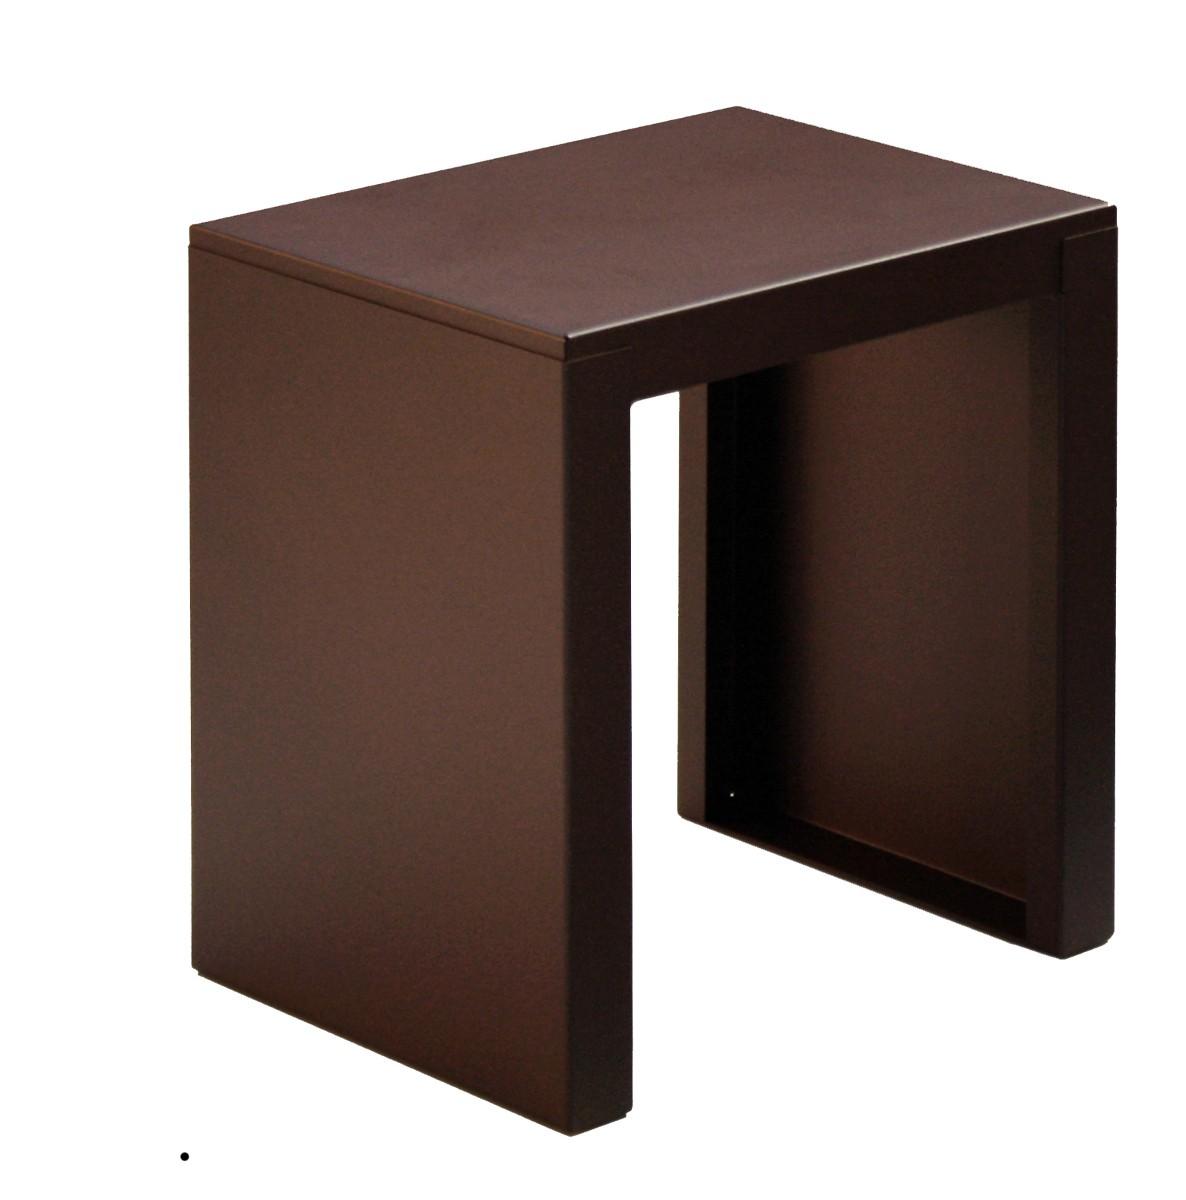 tabouret big irony outdoor de zeus 3 coloris. Black Bedroom Furniture Sets. Home Design Ideas